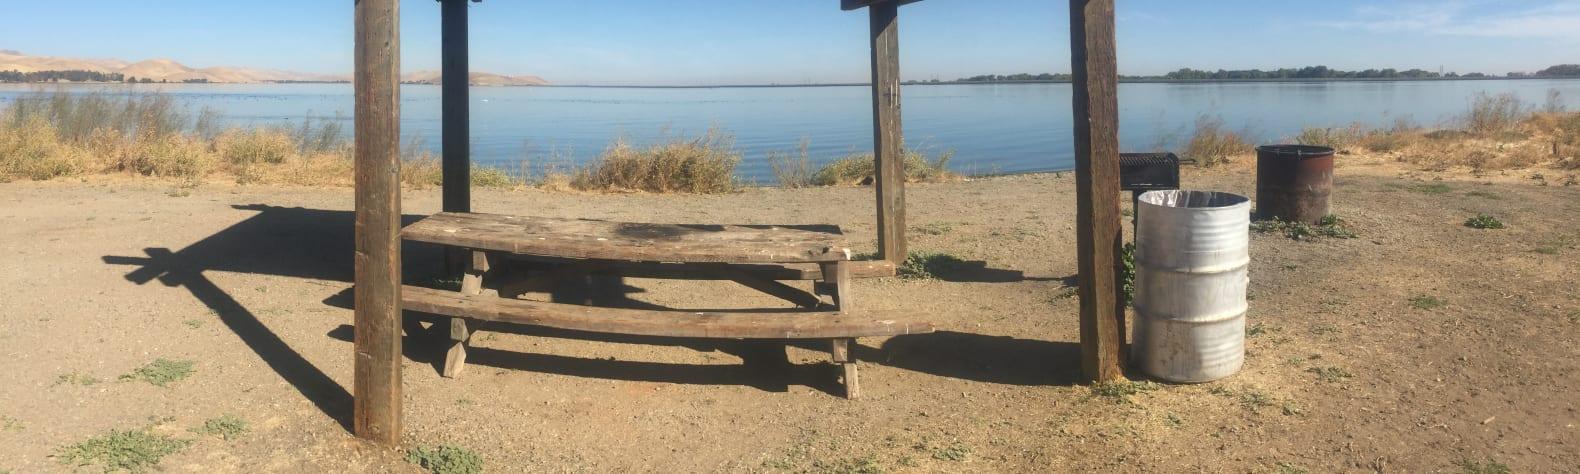 San Luis Reservoir State Recreation Area